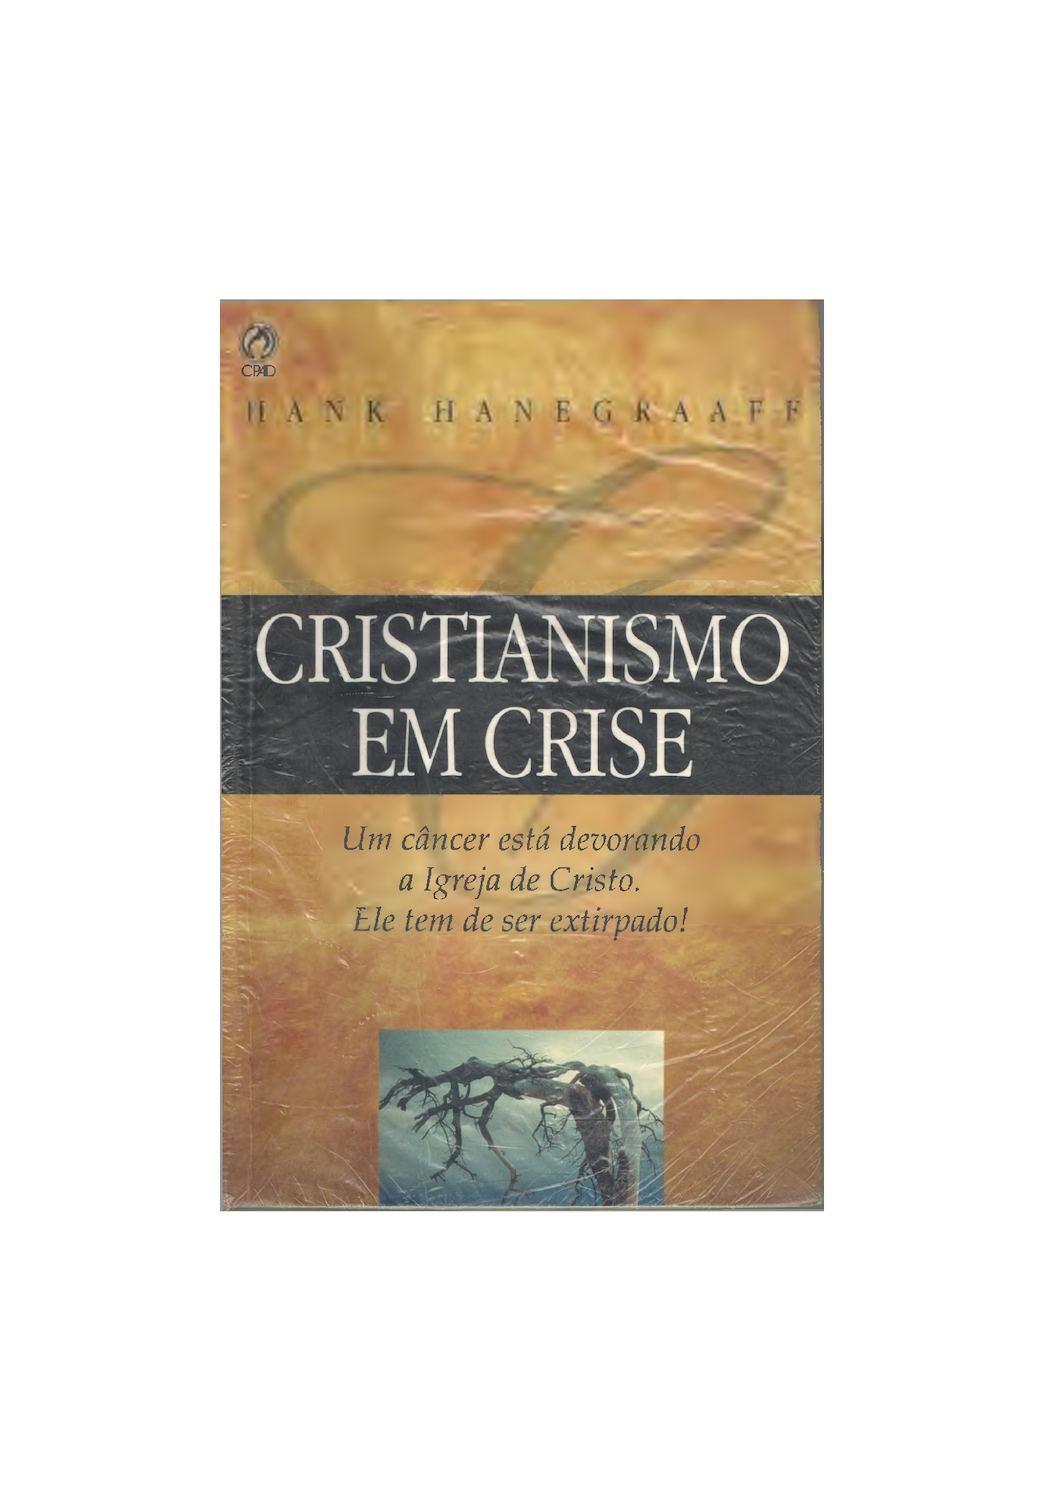 Calaméo - Cristianismo Em Crise - Hank Hanegraaff dd902be9f0